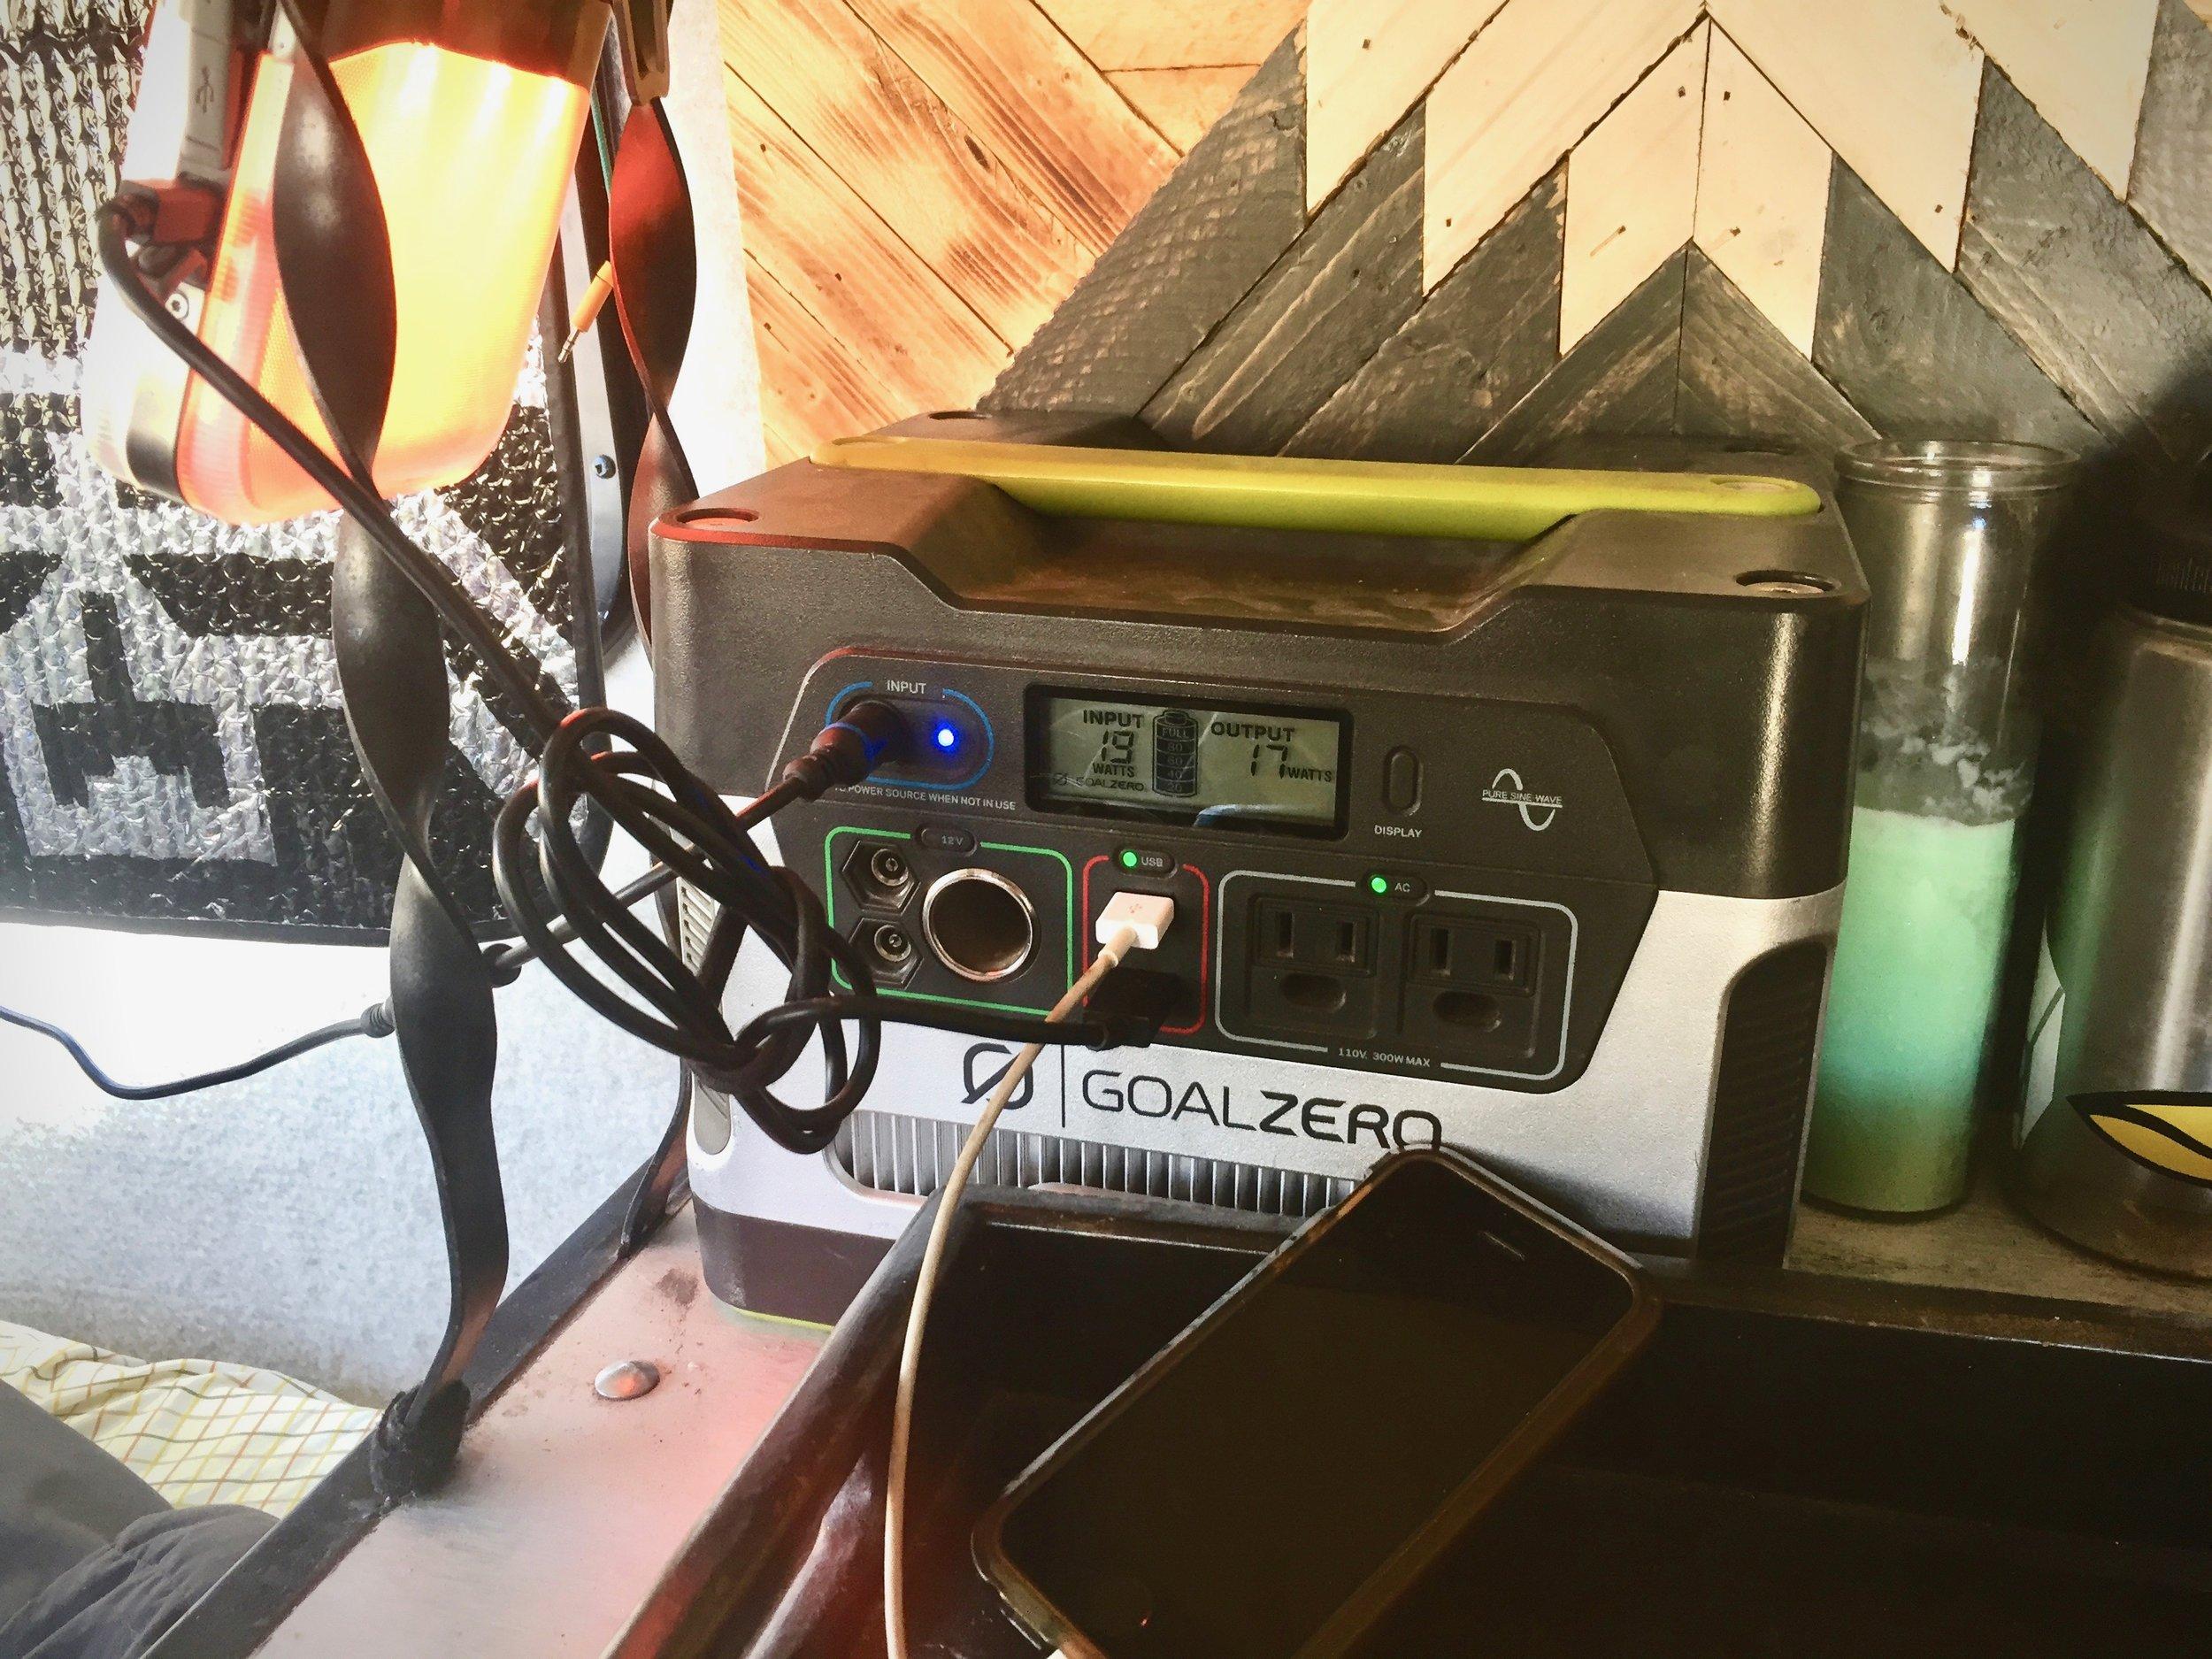 Yeti 400 Charging  Biolite BaseLantern and iPhone SE. 19 watts input from Escape 30 Panel (old school). 17 watts output to BaseLantern and iPhone.